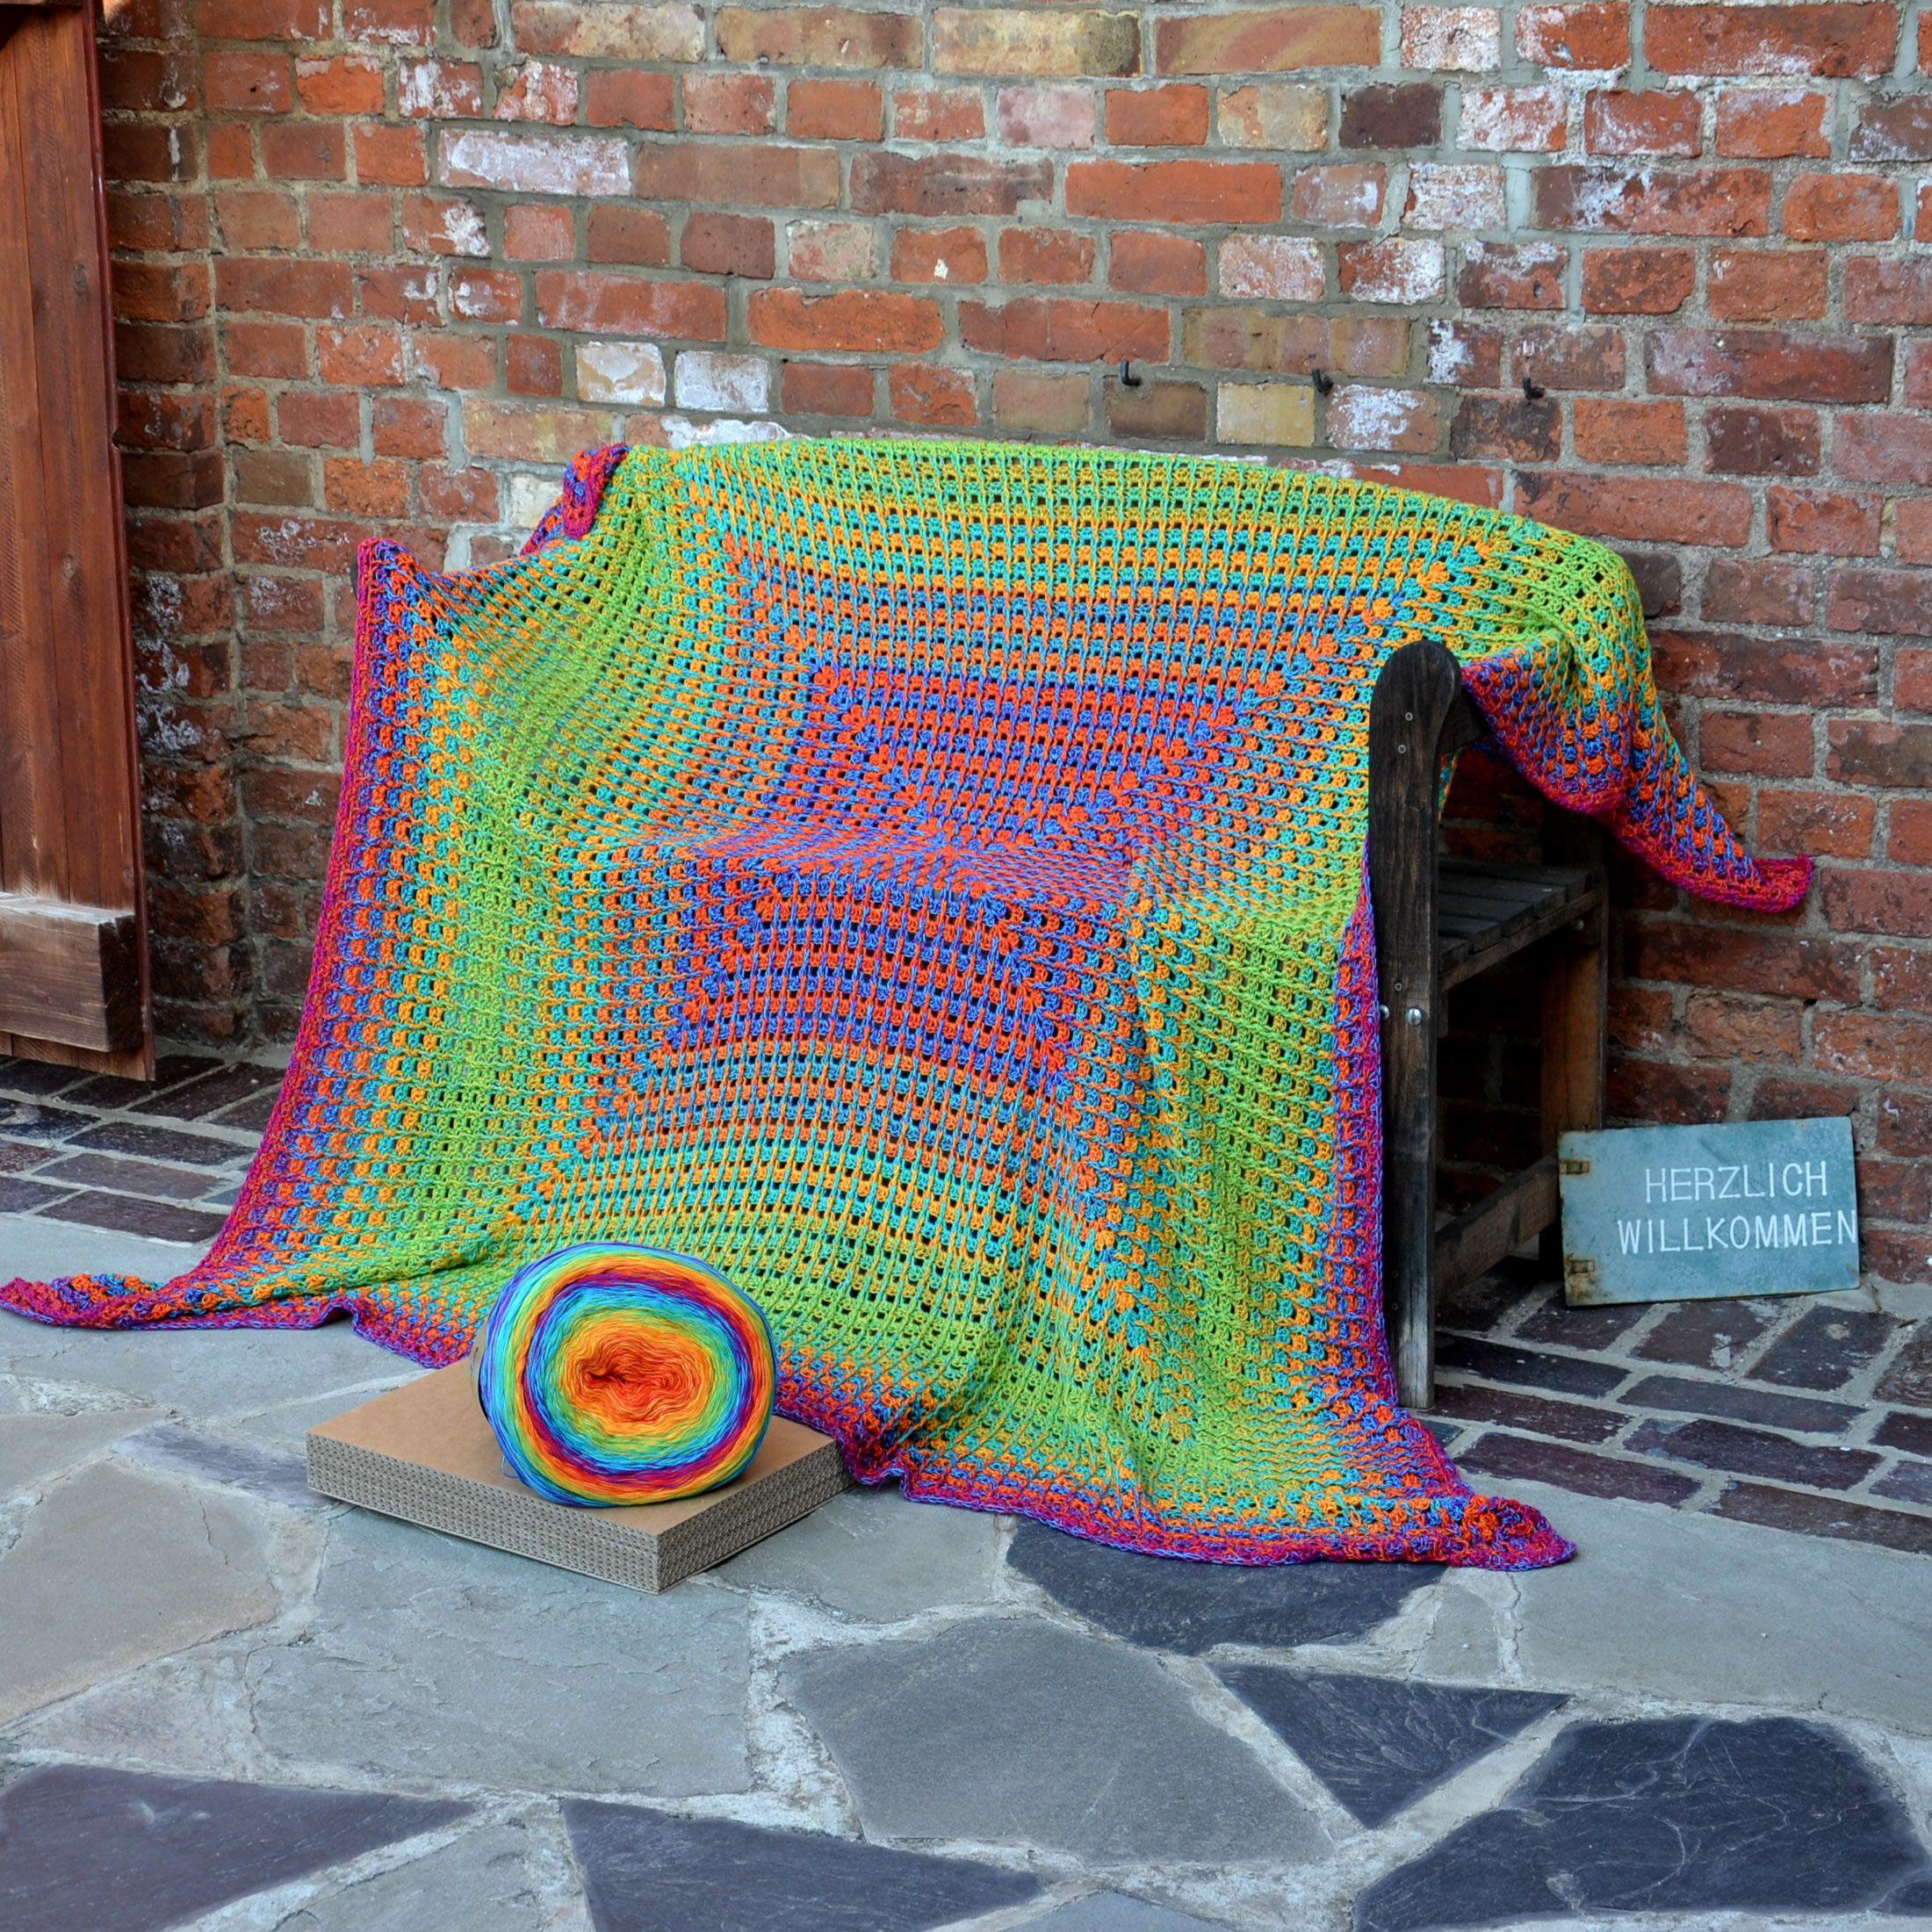 Häkelset Lola 4fach Riesen Decke Kunterbunt Häkelsets Pinterest